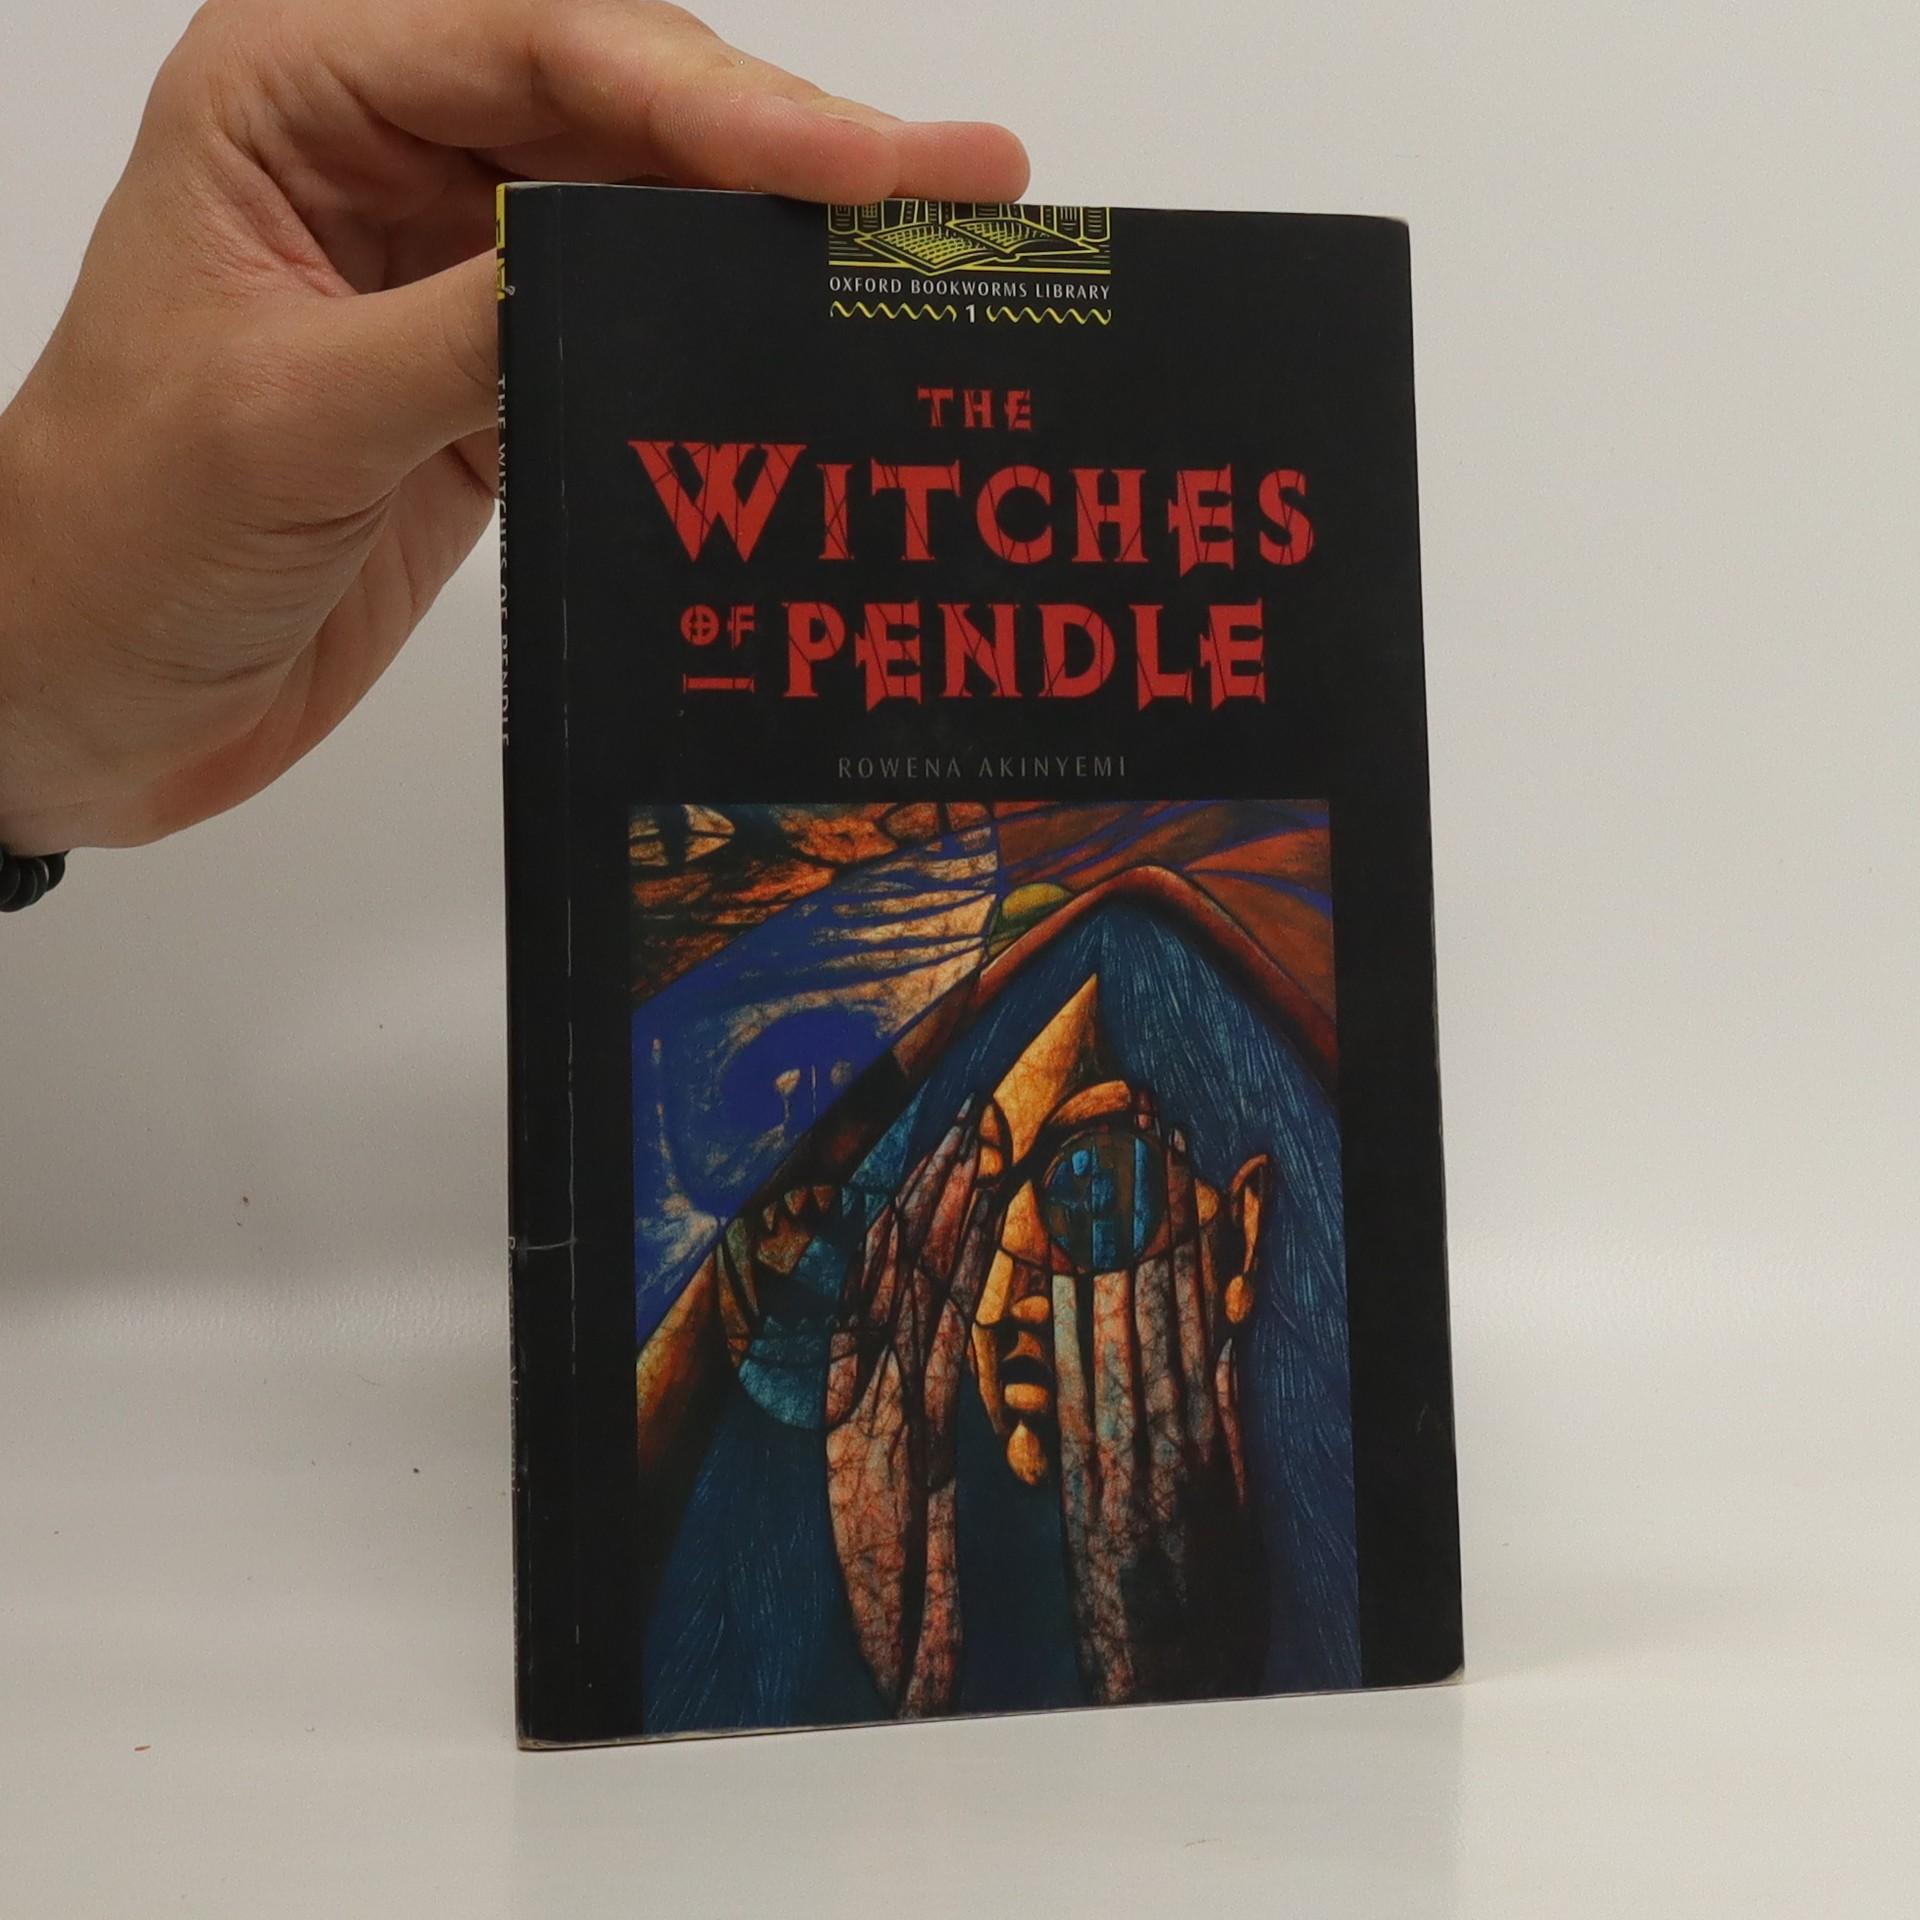 antikvární kniha The witches of Pendle, neuveden